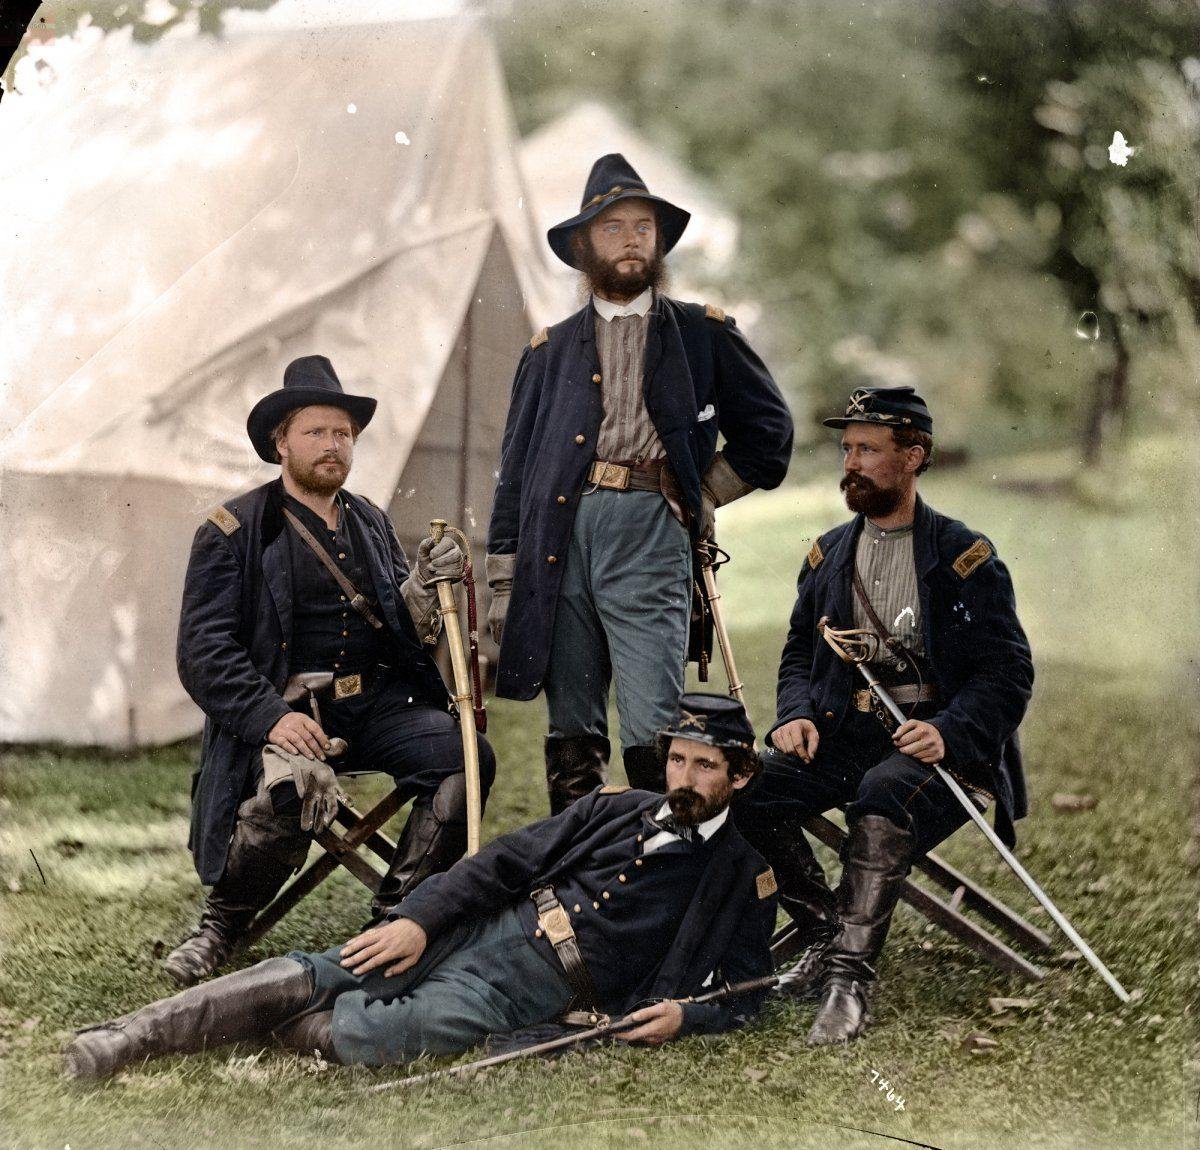 Events Leading to War - A Civil War Timeline